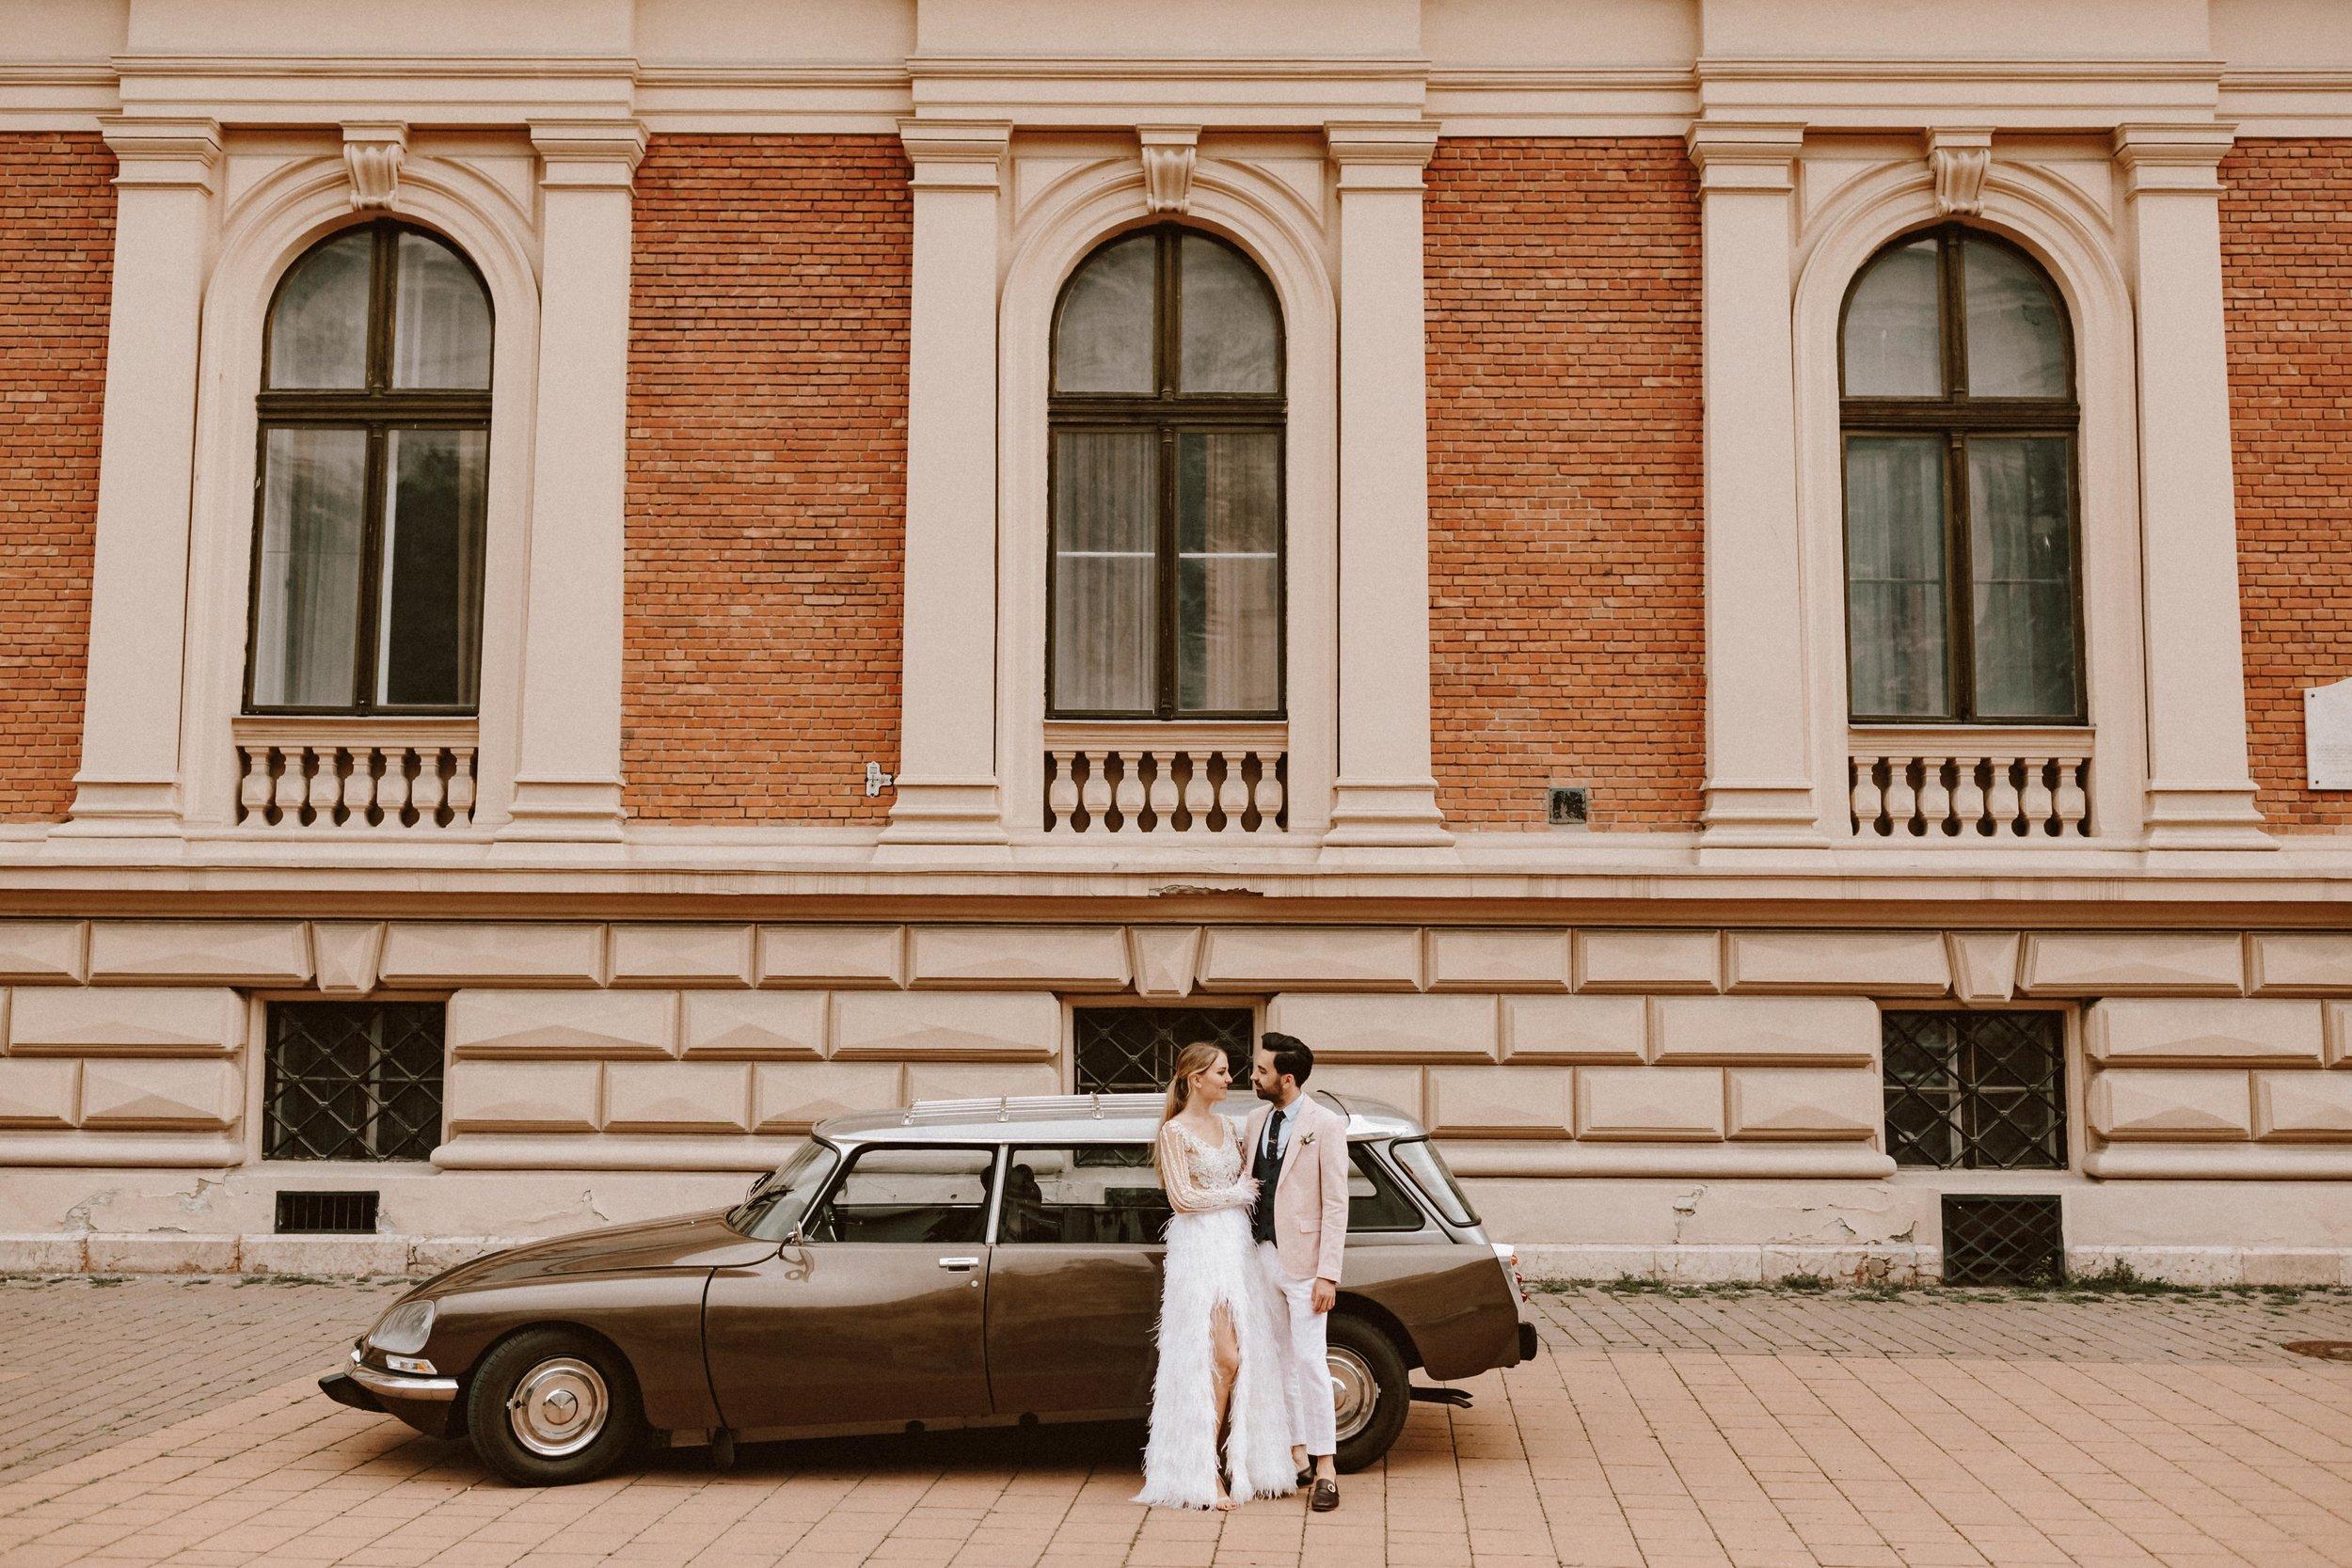 1819-Evelin+Peti-wedding-097-w.jpg